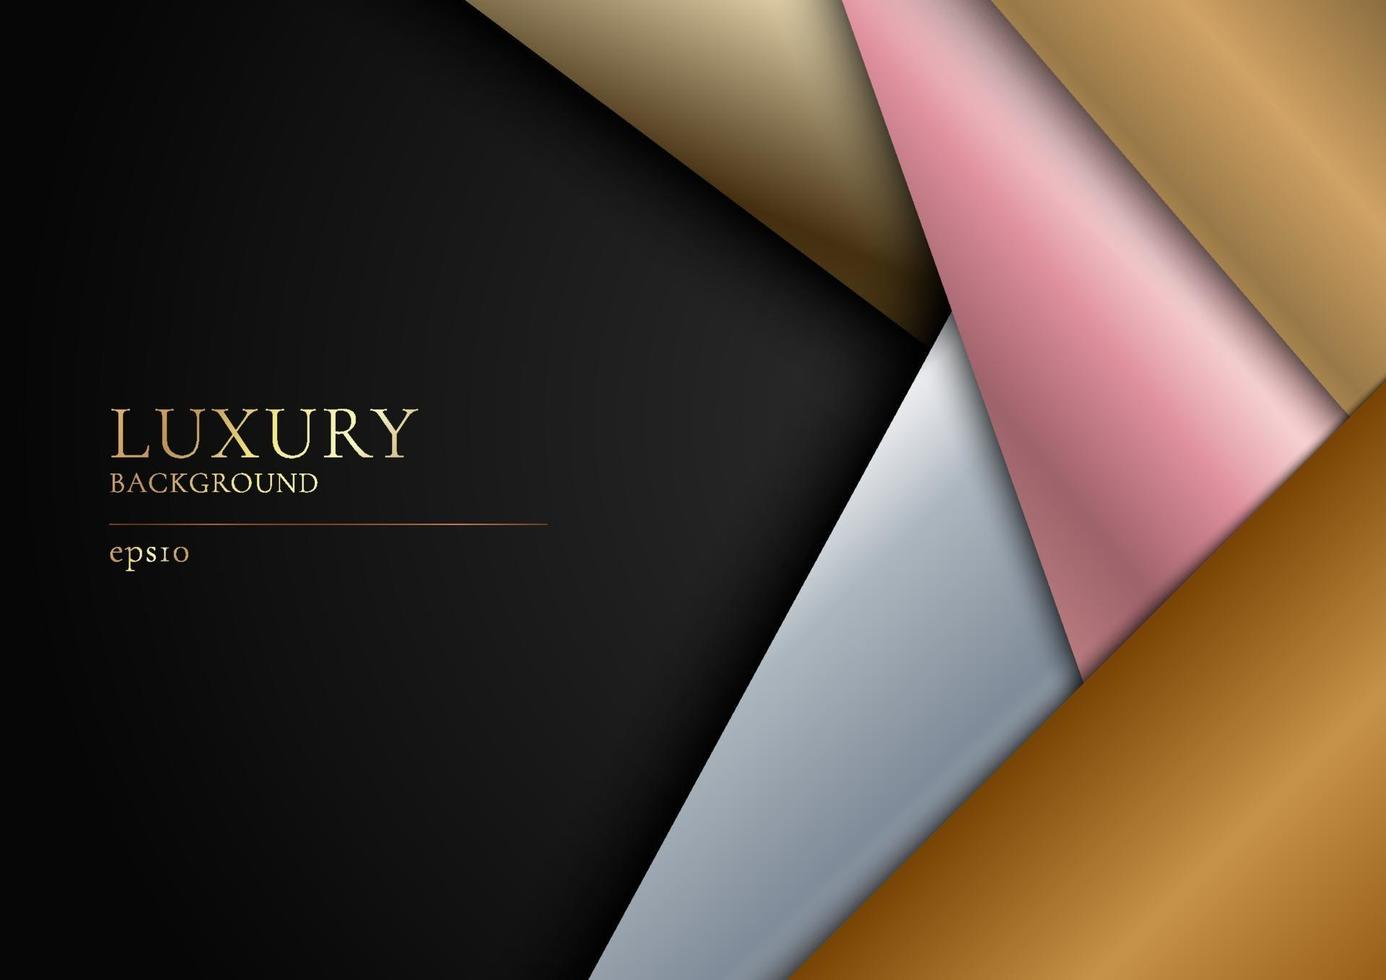 abstrakt gyllene, silver, rosa guld överlappande lager på svart bakgrund modern lyxig design. vektor